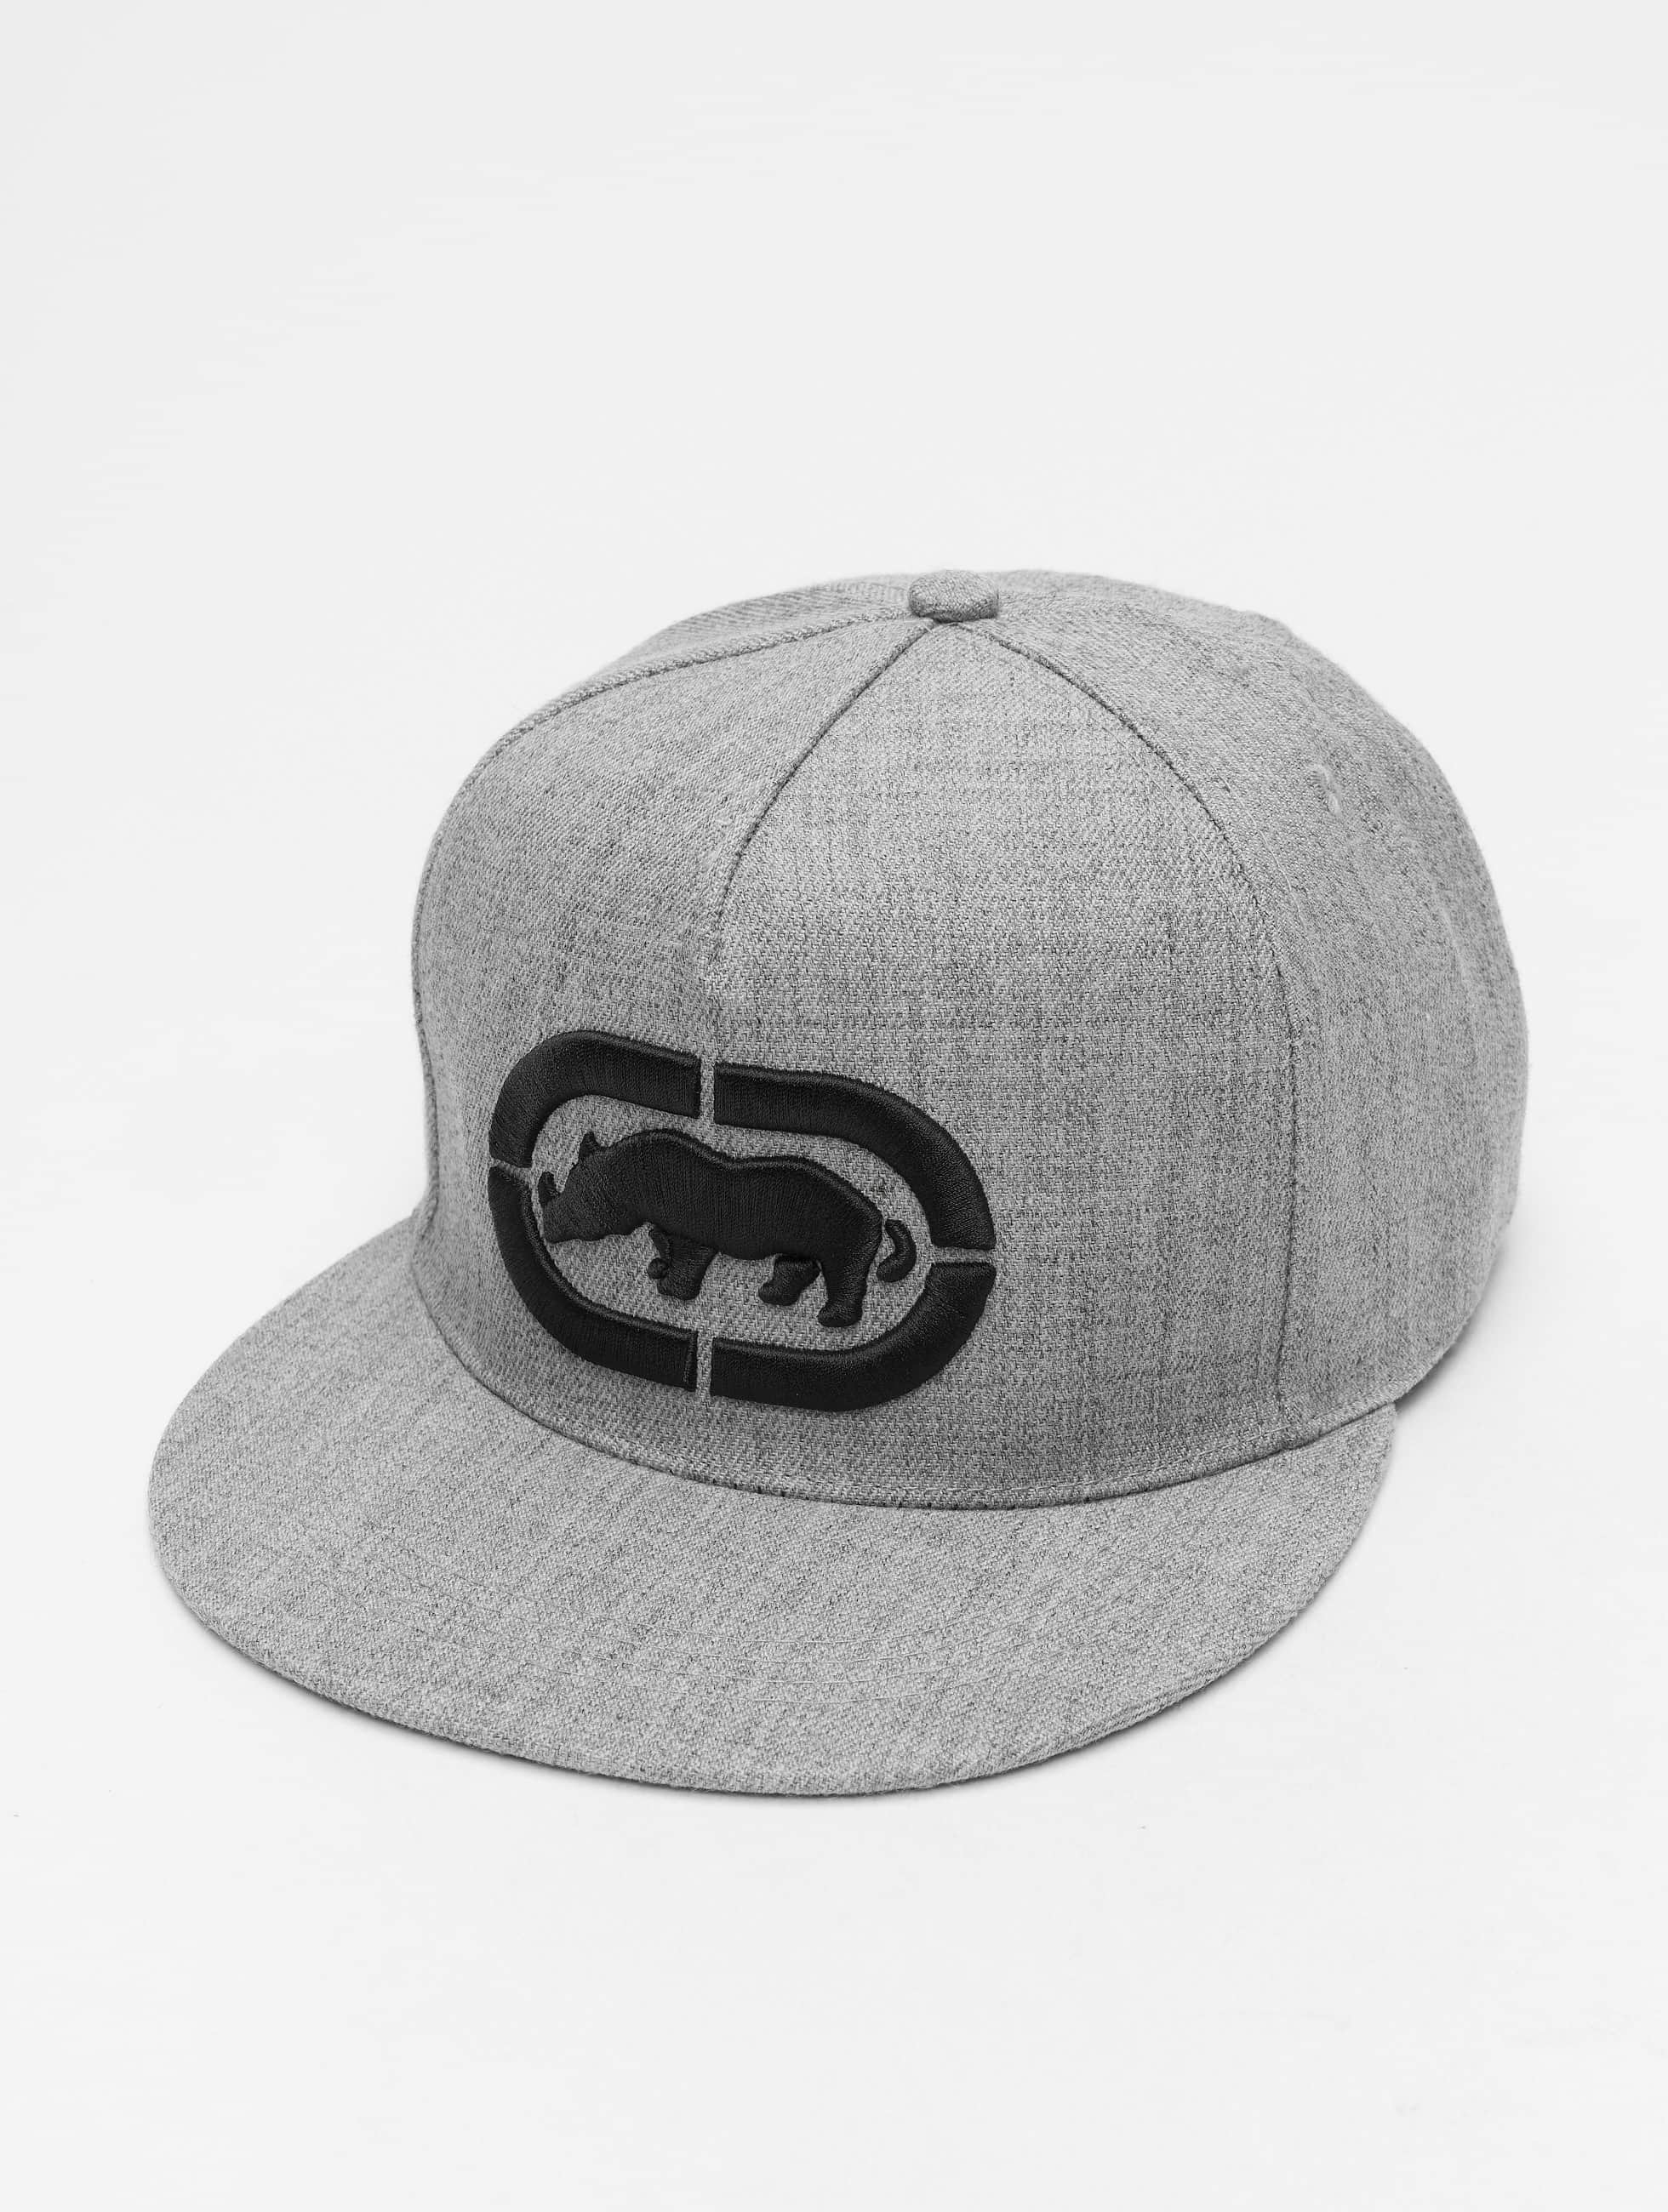 Ecko Unltd. / Snapback Cap Base in grey Adjustable